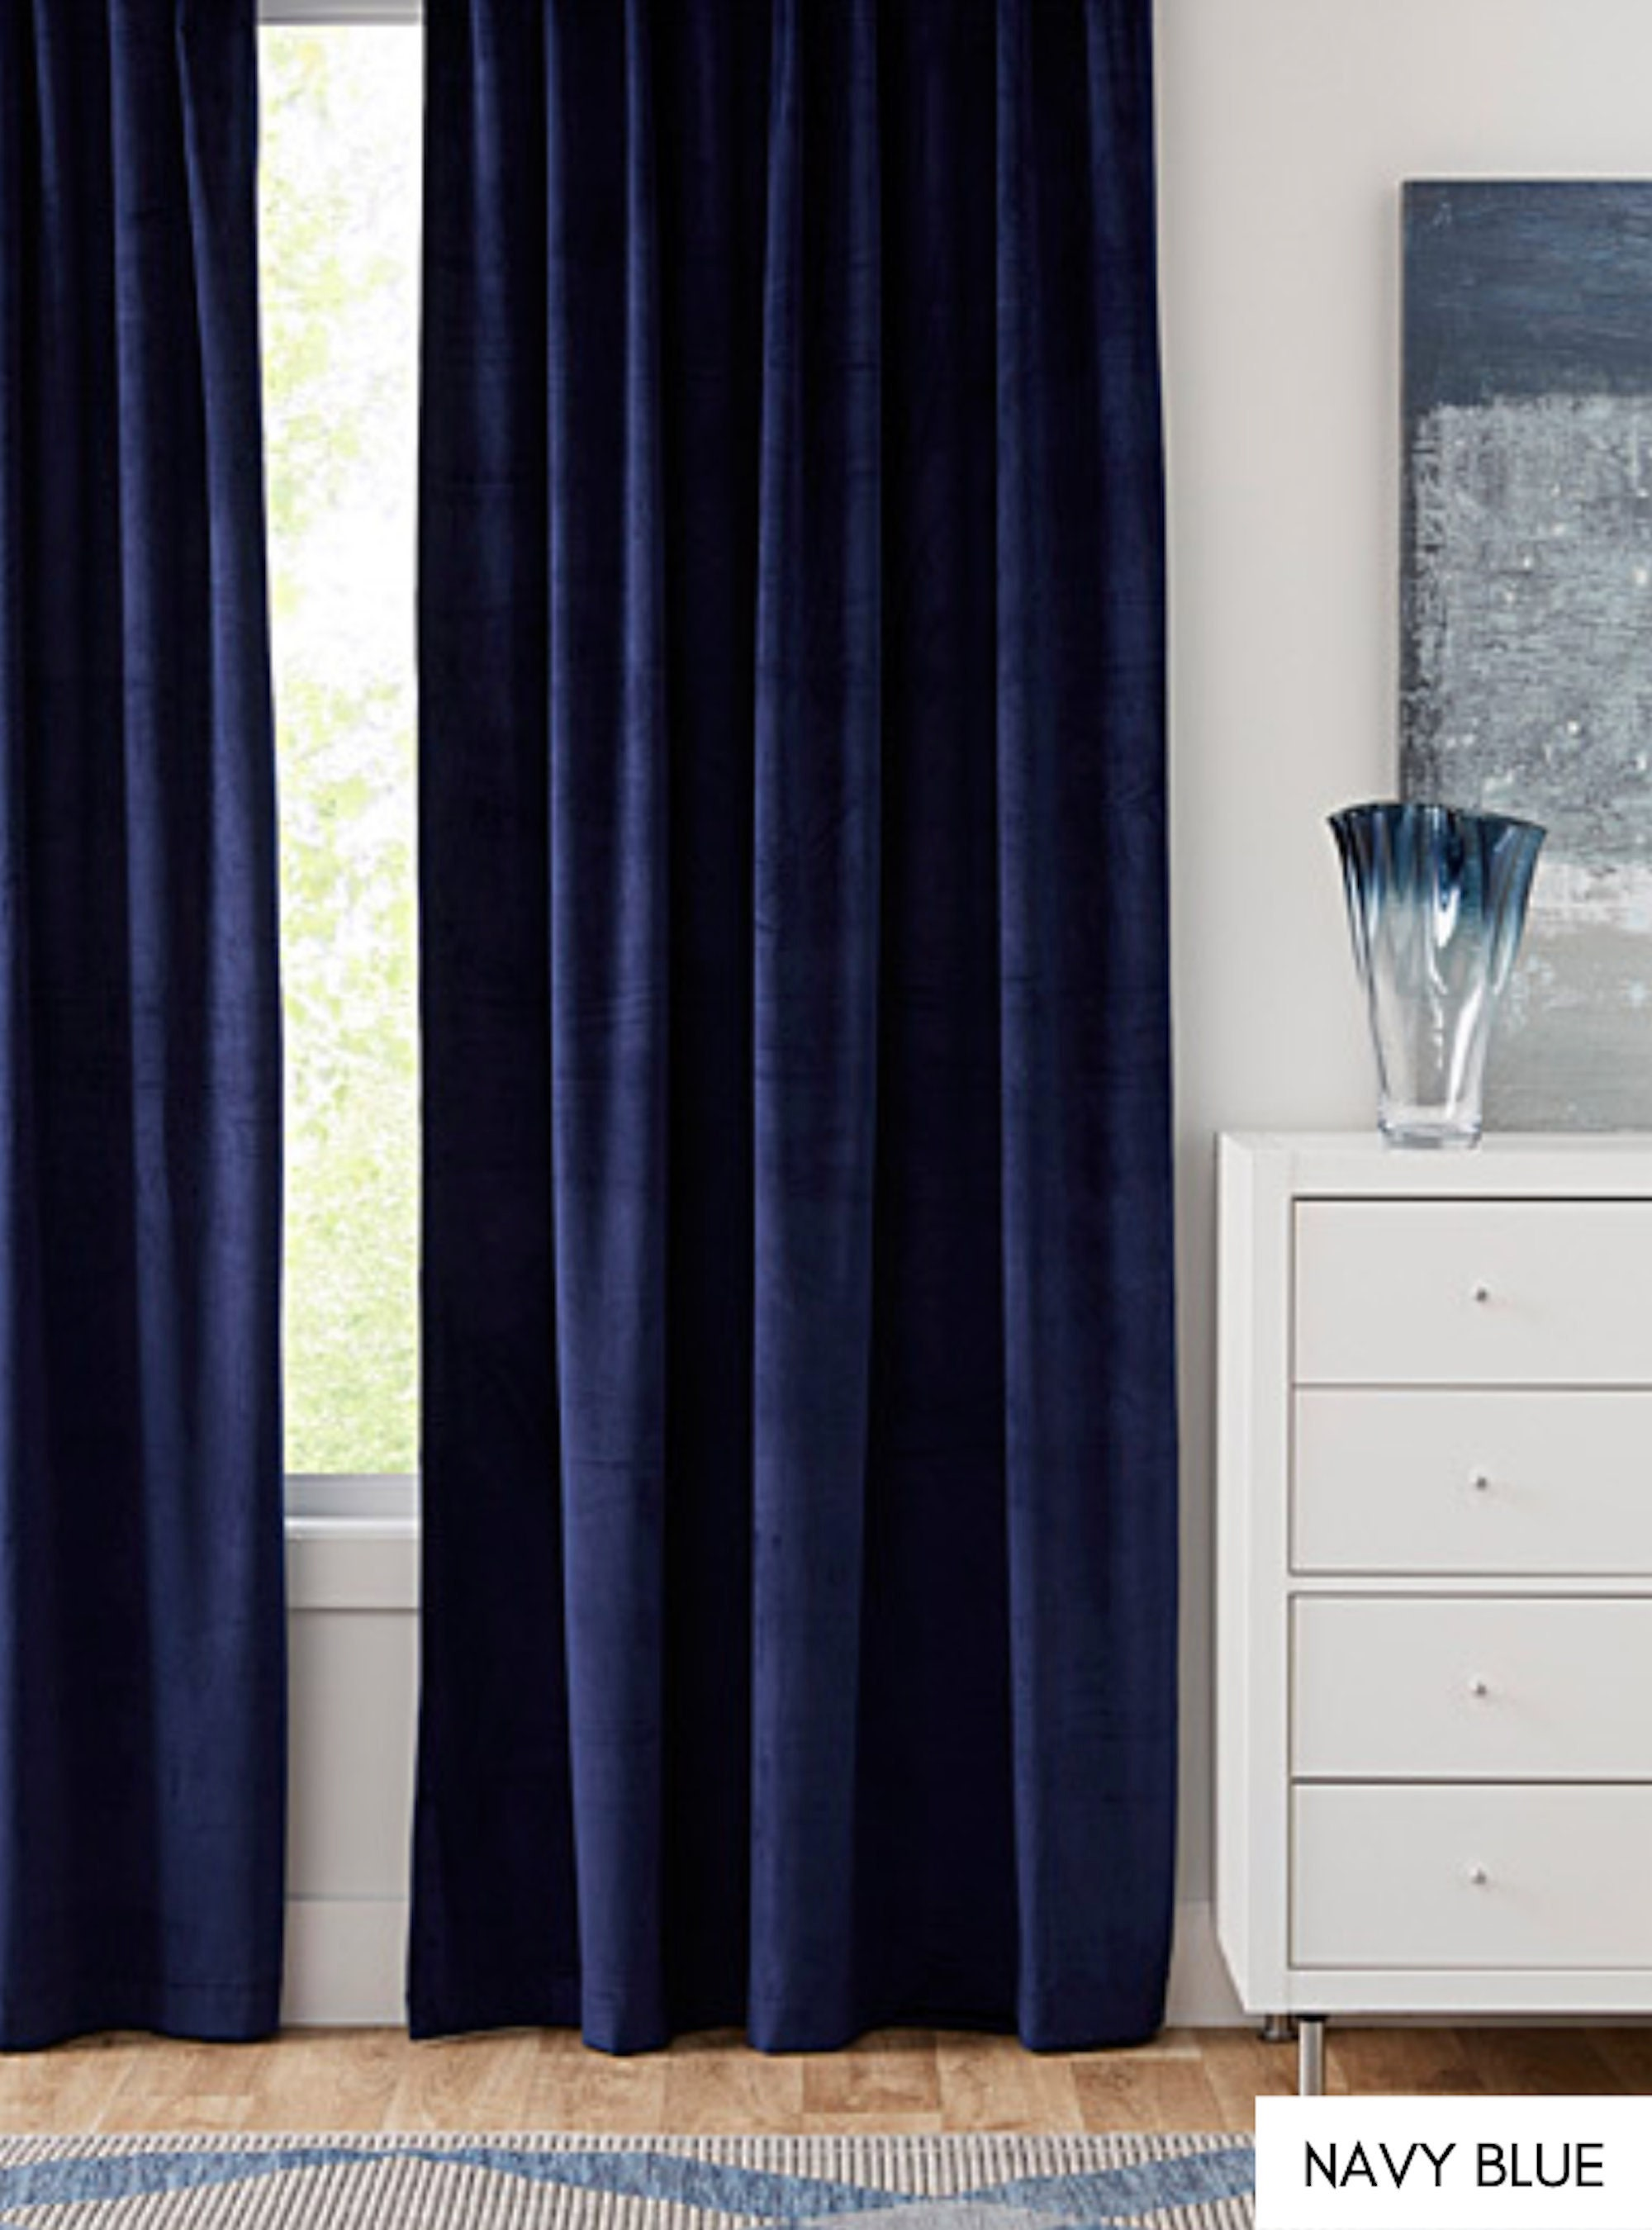 Velvet Curtains Custom Window Curtain Panels Curtain Panels Blackout Curtains Dining Room Curtains Bedroom Curtains Linen Curtains